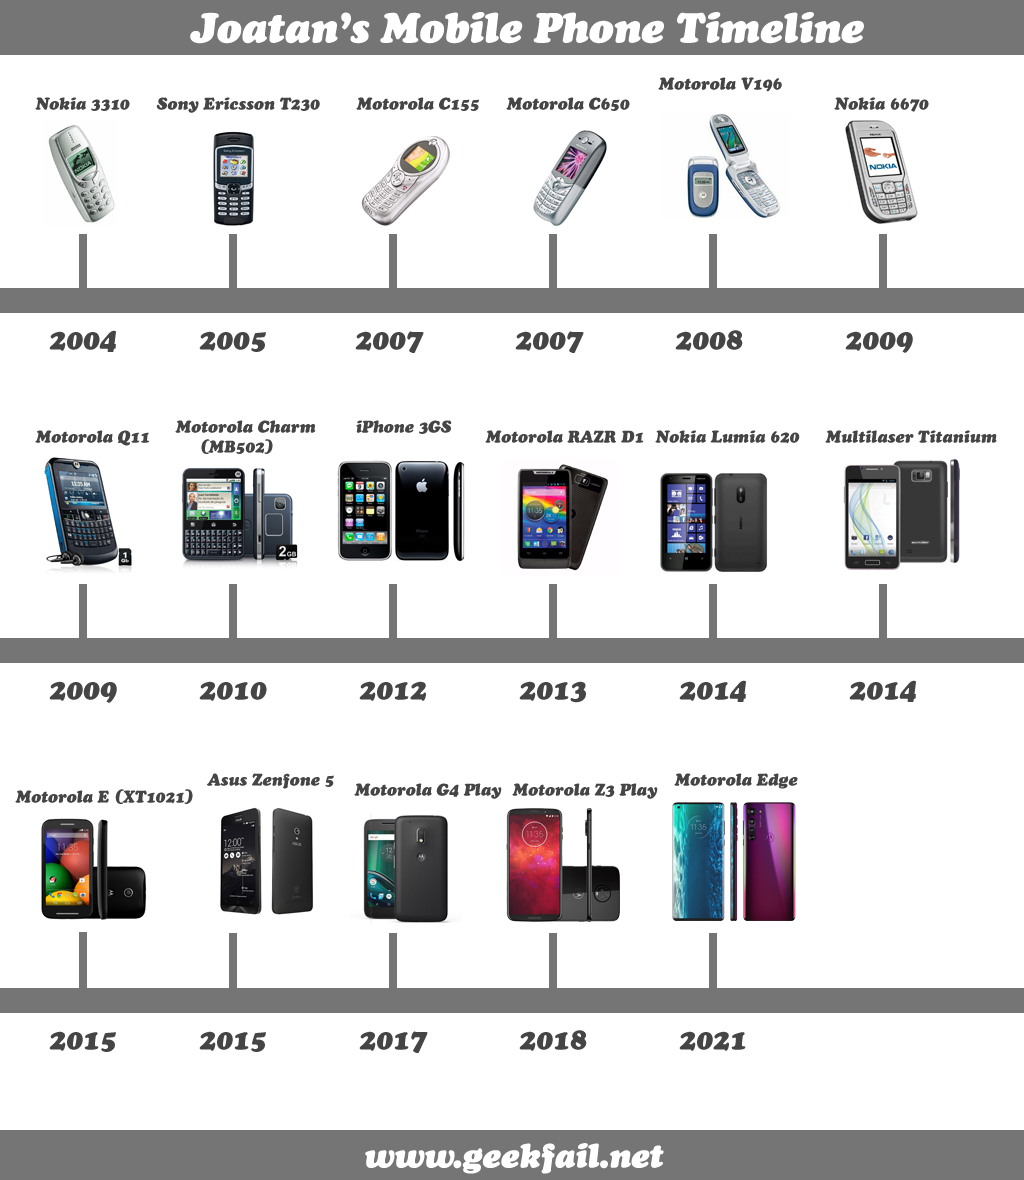 Joata's Mobile Phone Timeline